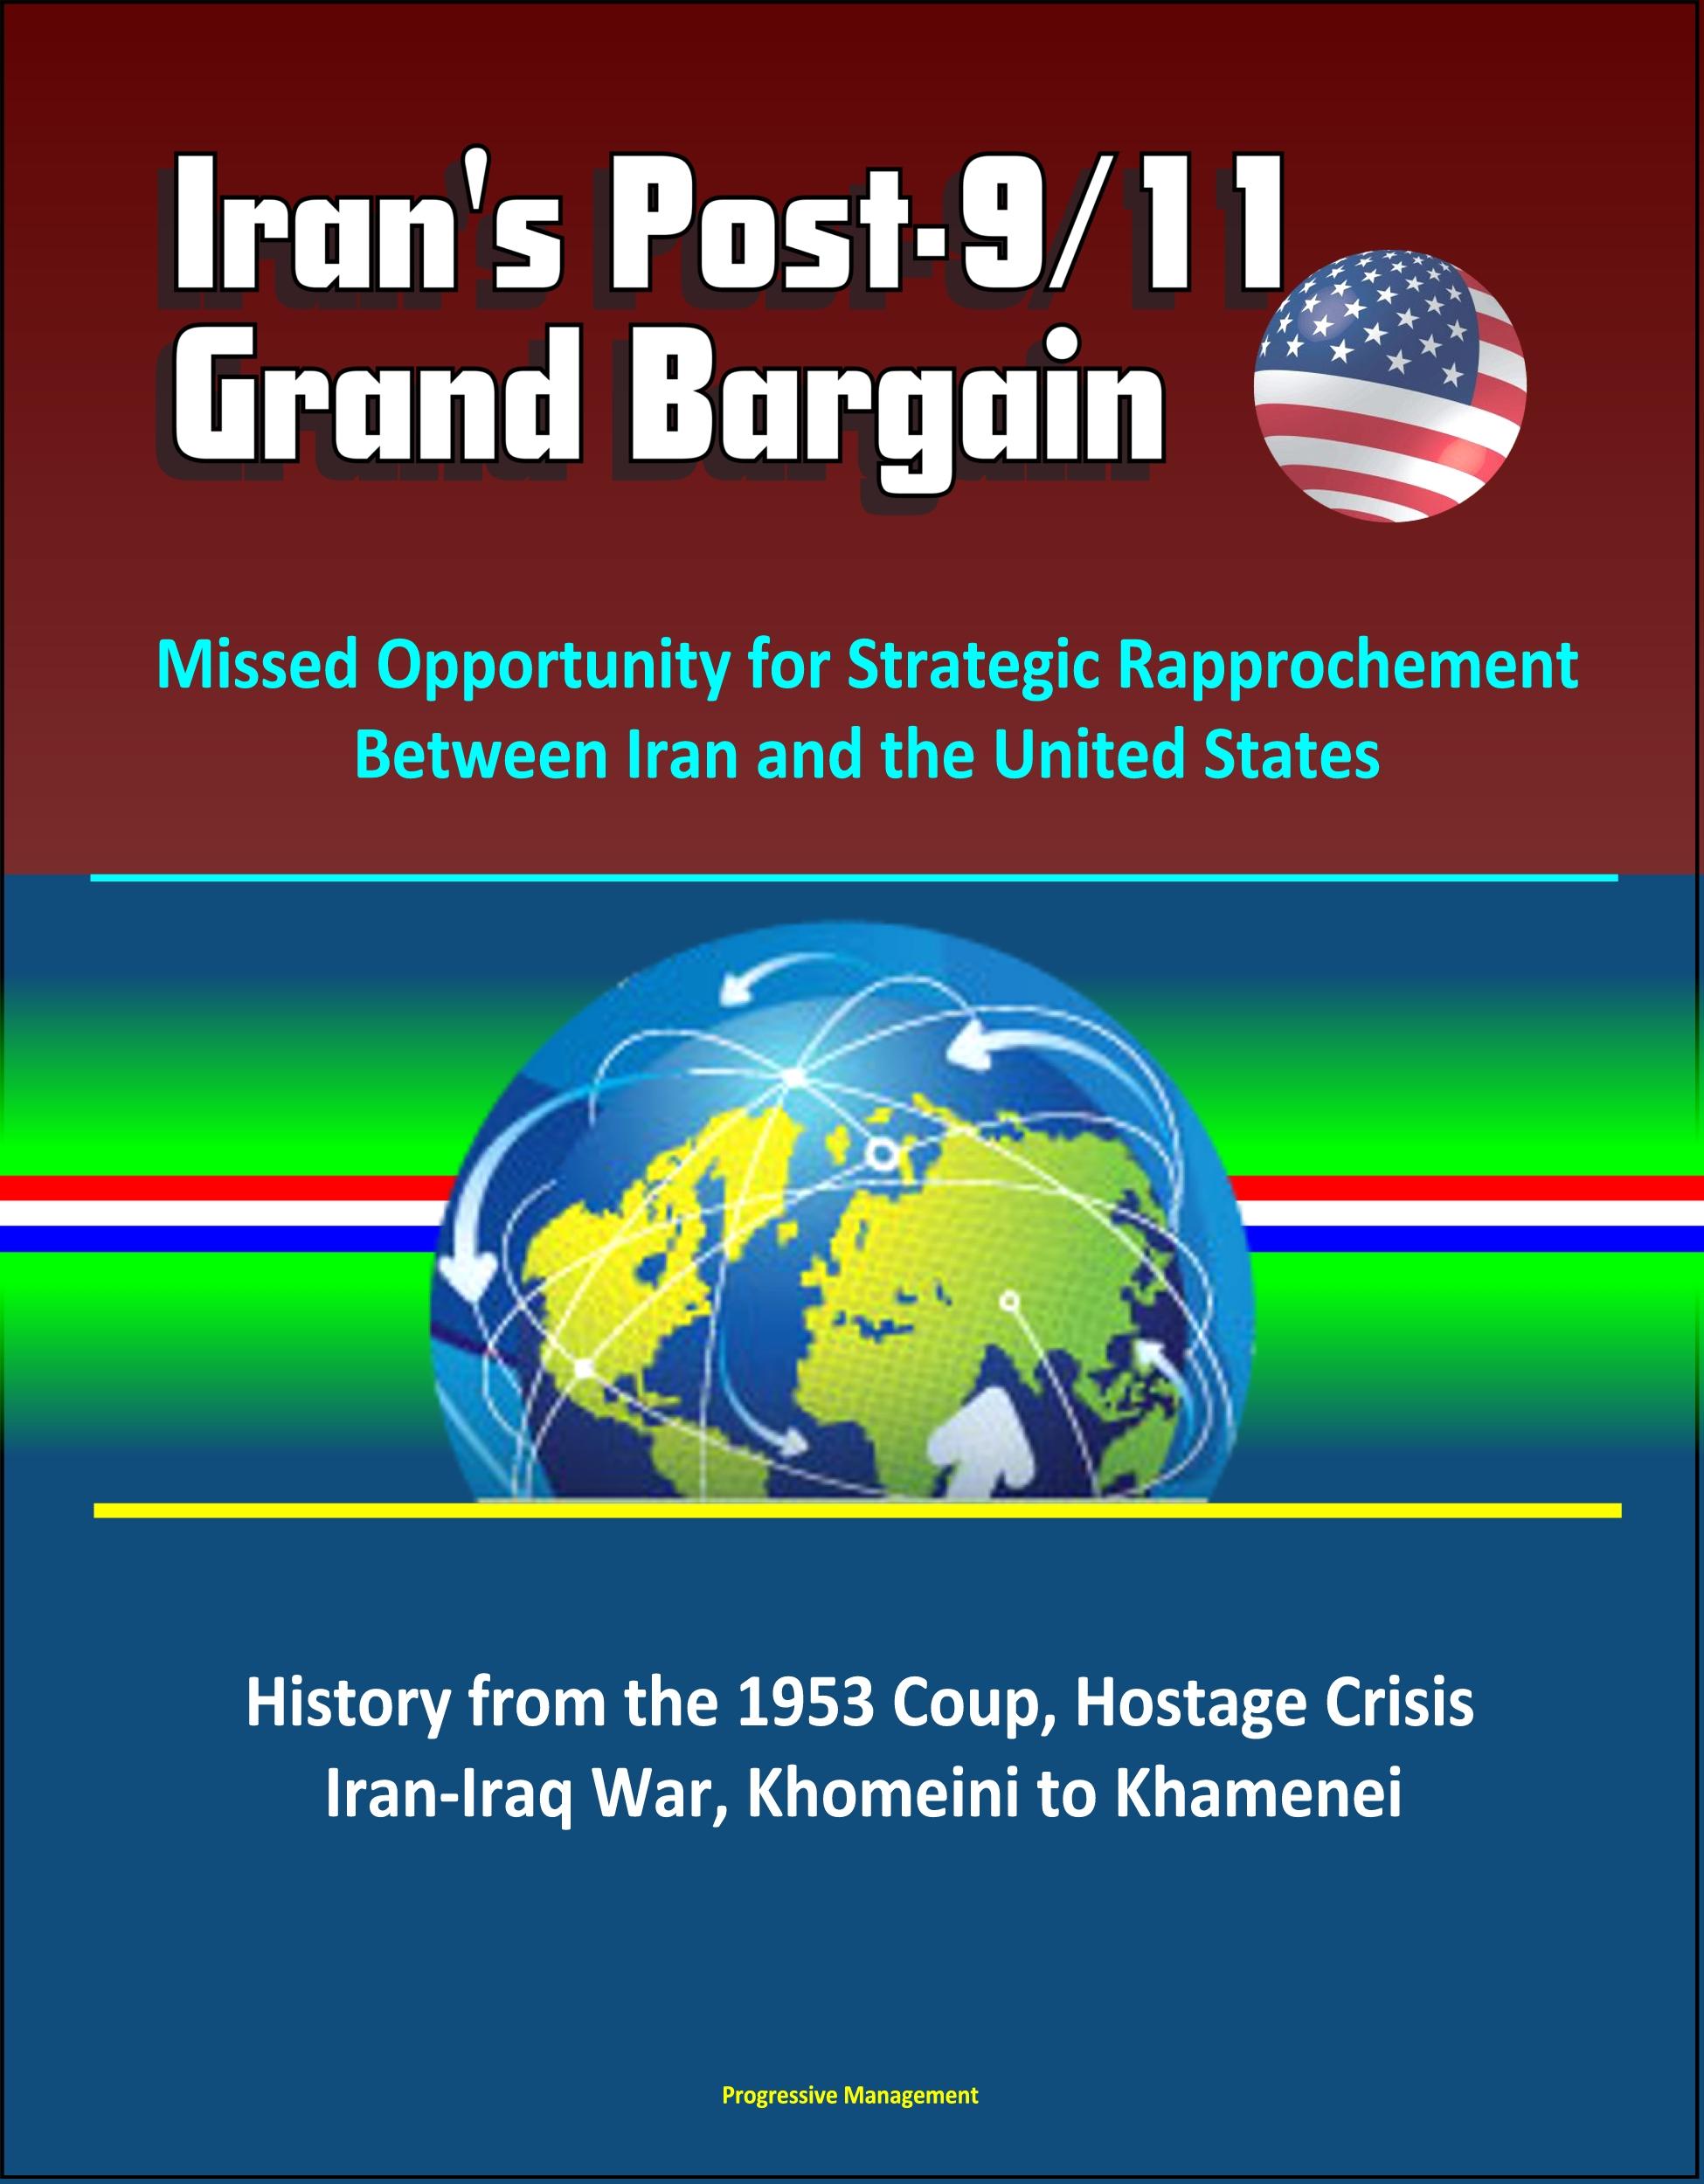 iran hostage crisis thesis